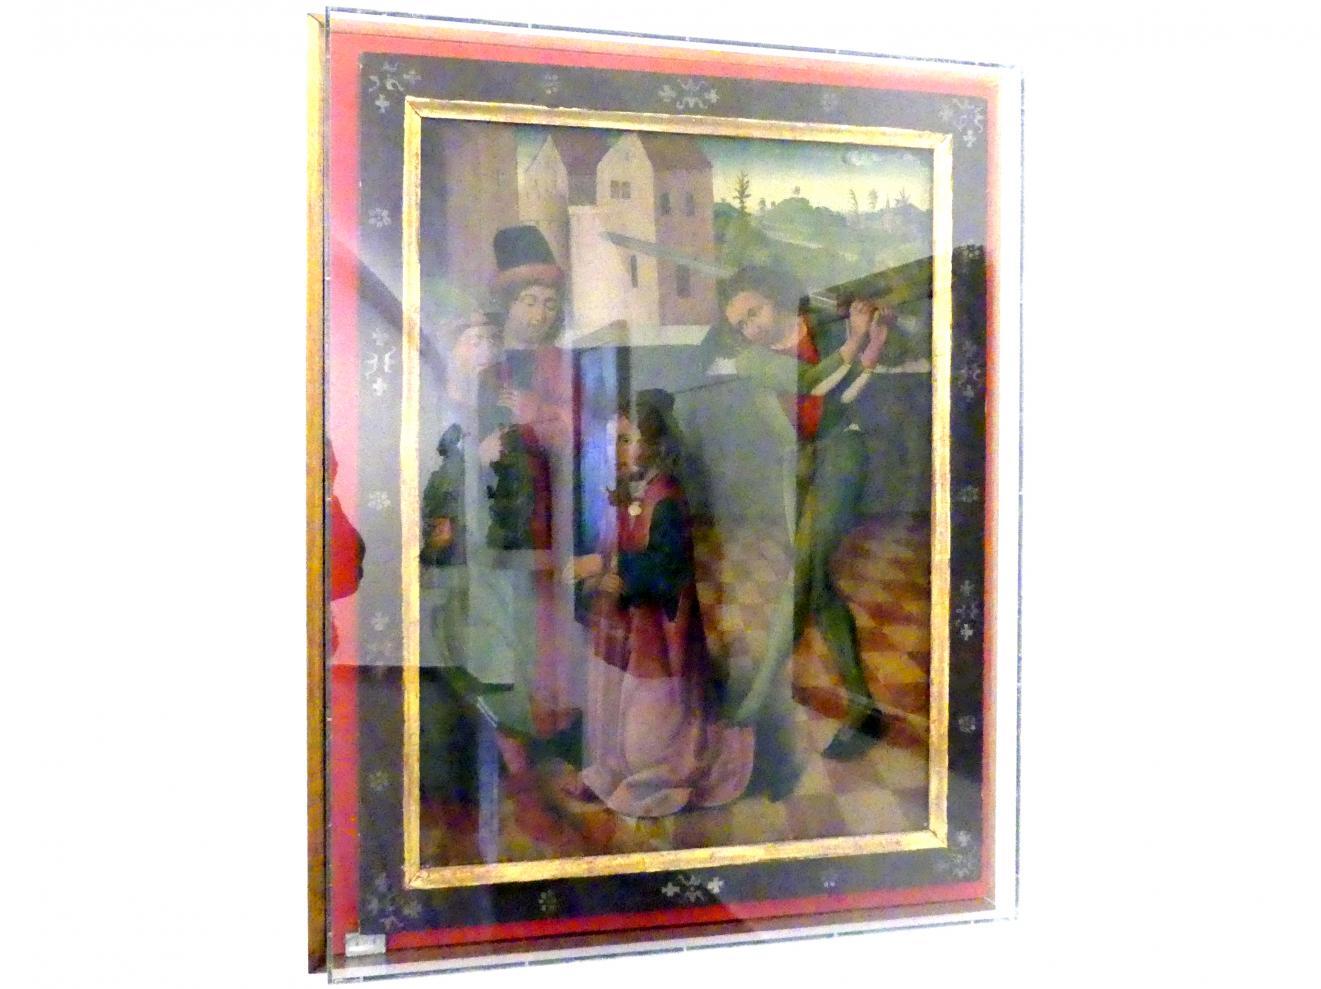 Enthauptung des Hl. Jakobus des Älteren, um 1470